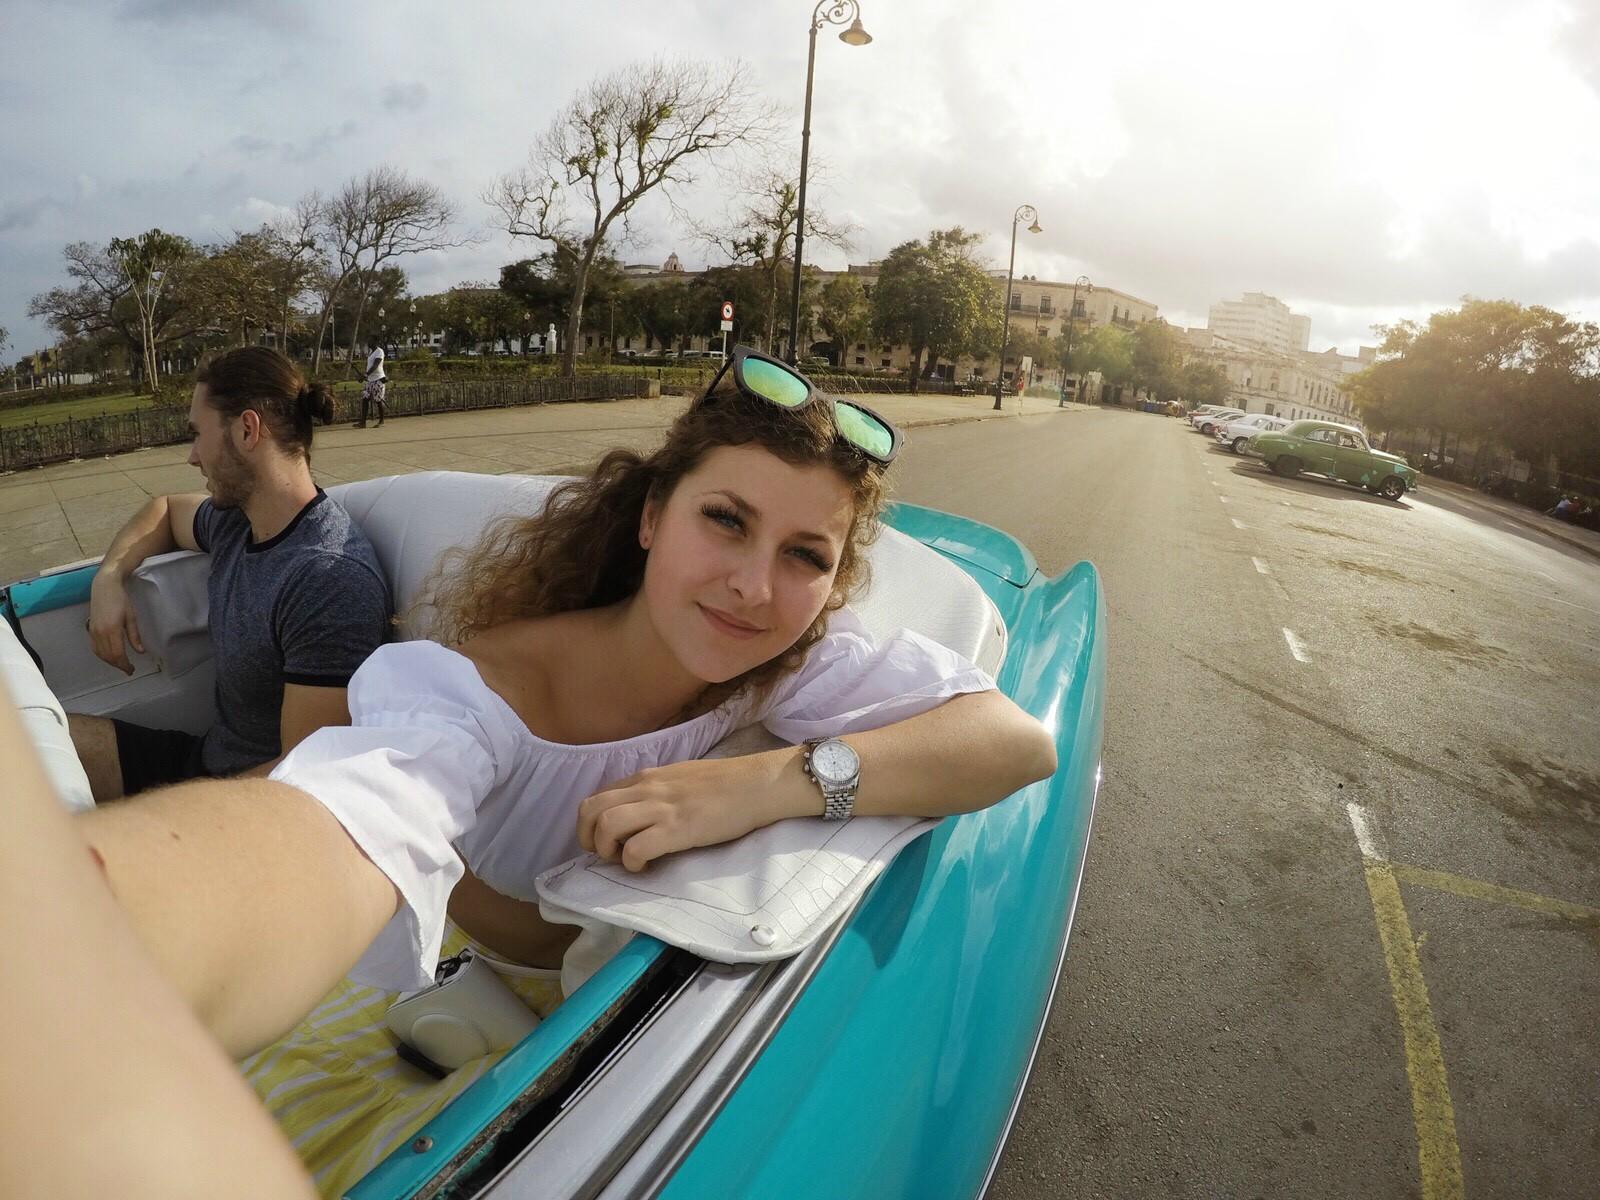 Havana jazda v historickom aute